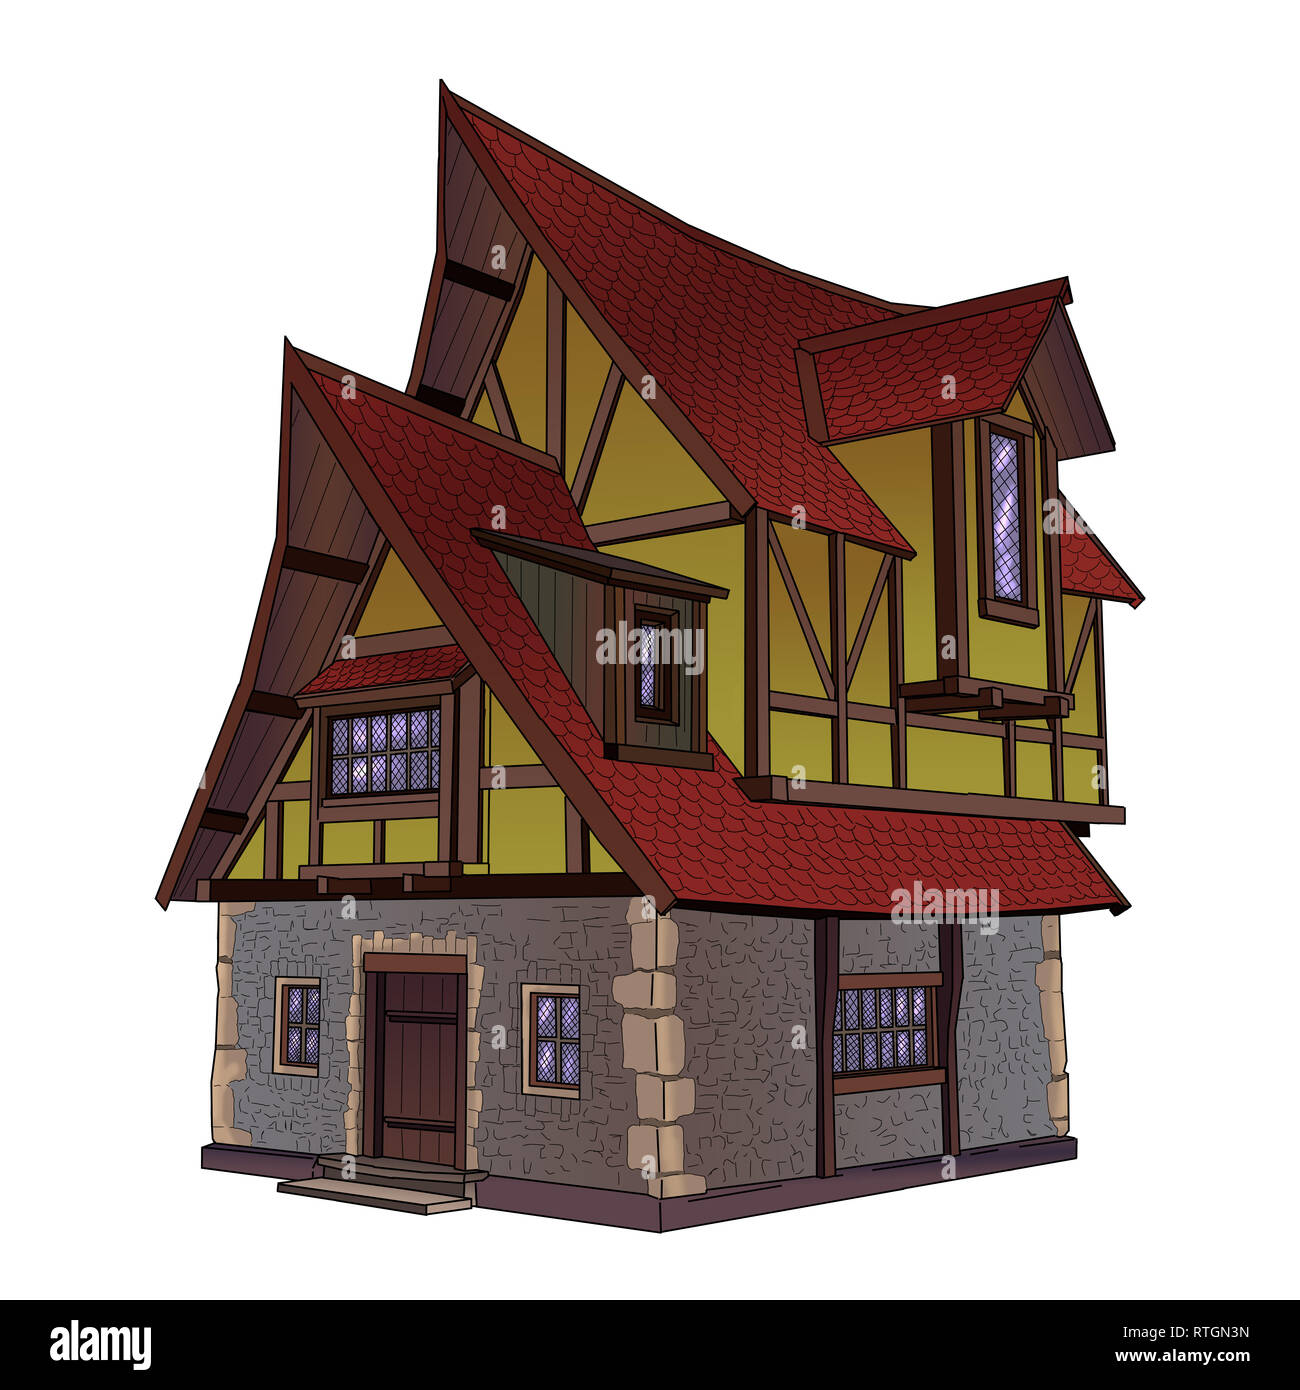 Medieval europen house - Stock Image